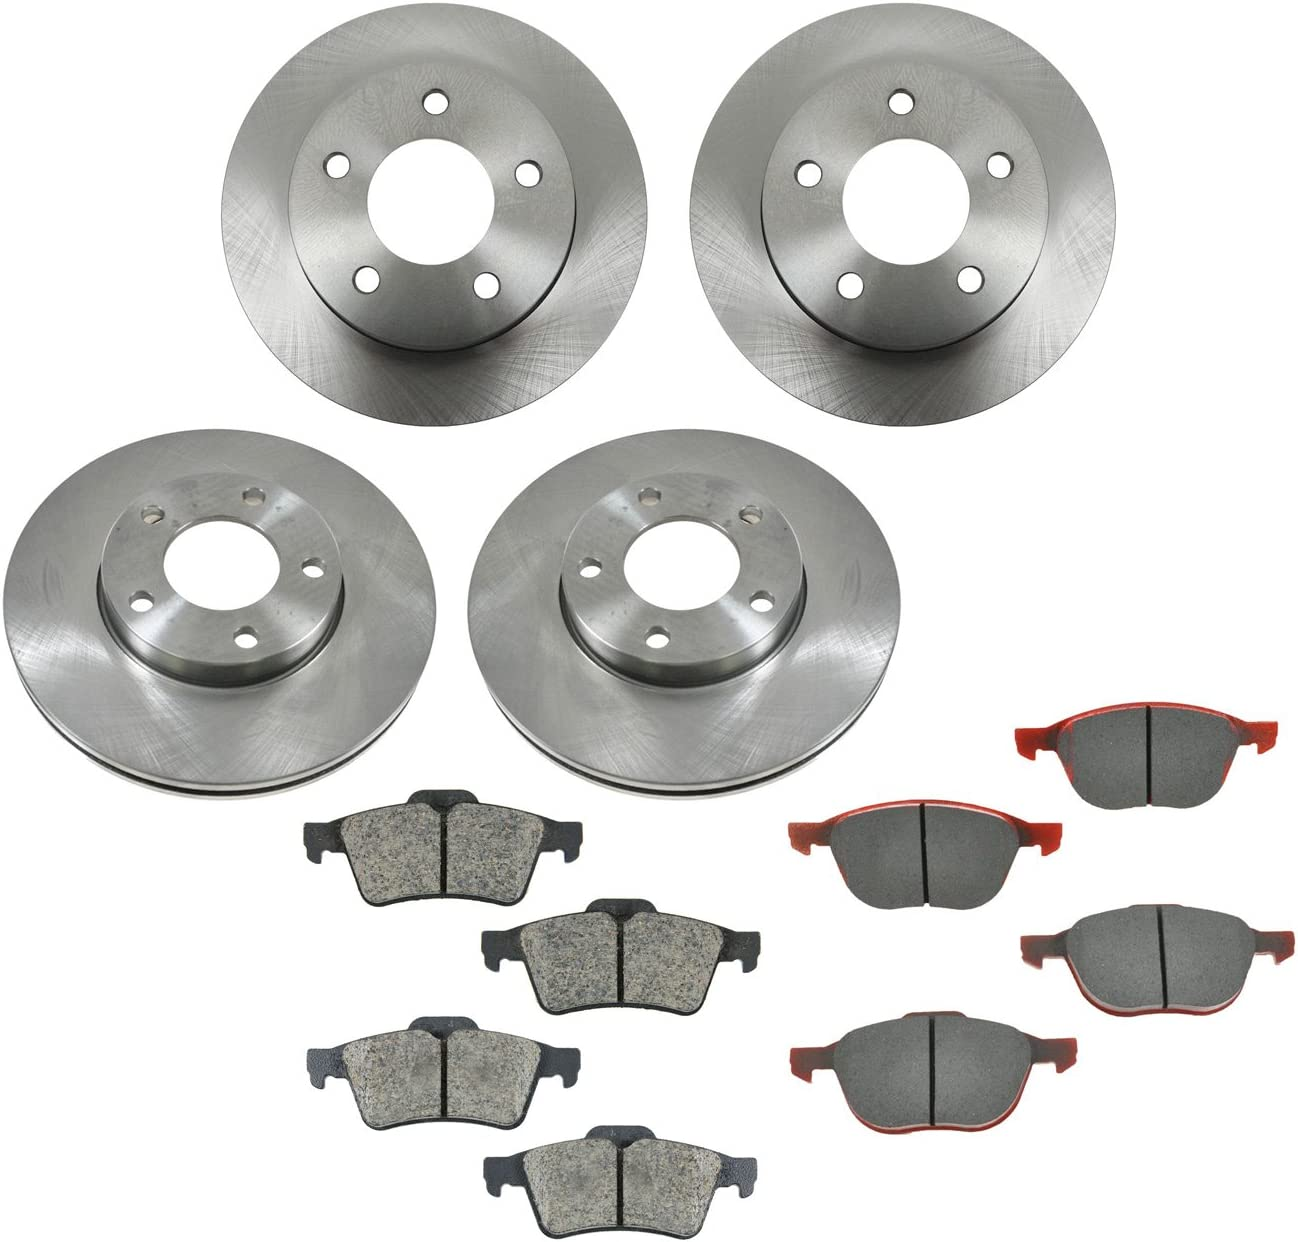 Front And Rear Brake Rotors /& Ceramic Pads For 2014 2015 2016 Mazda 3-2.0L